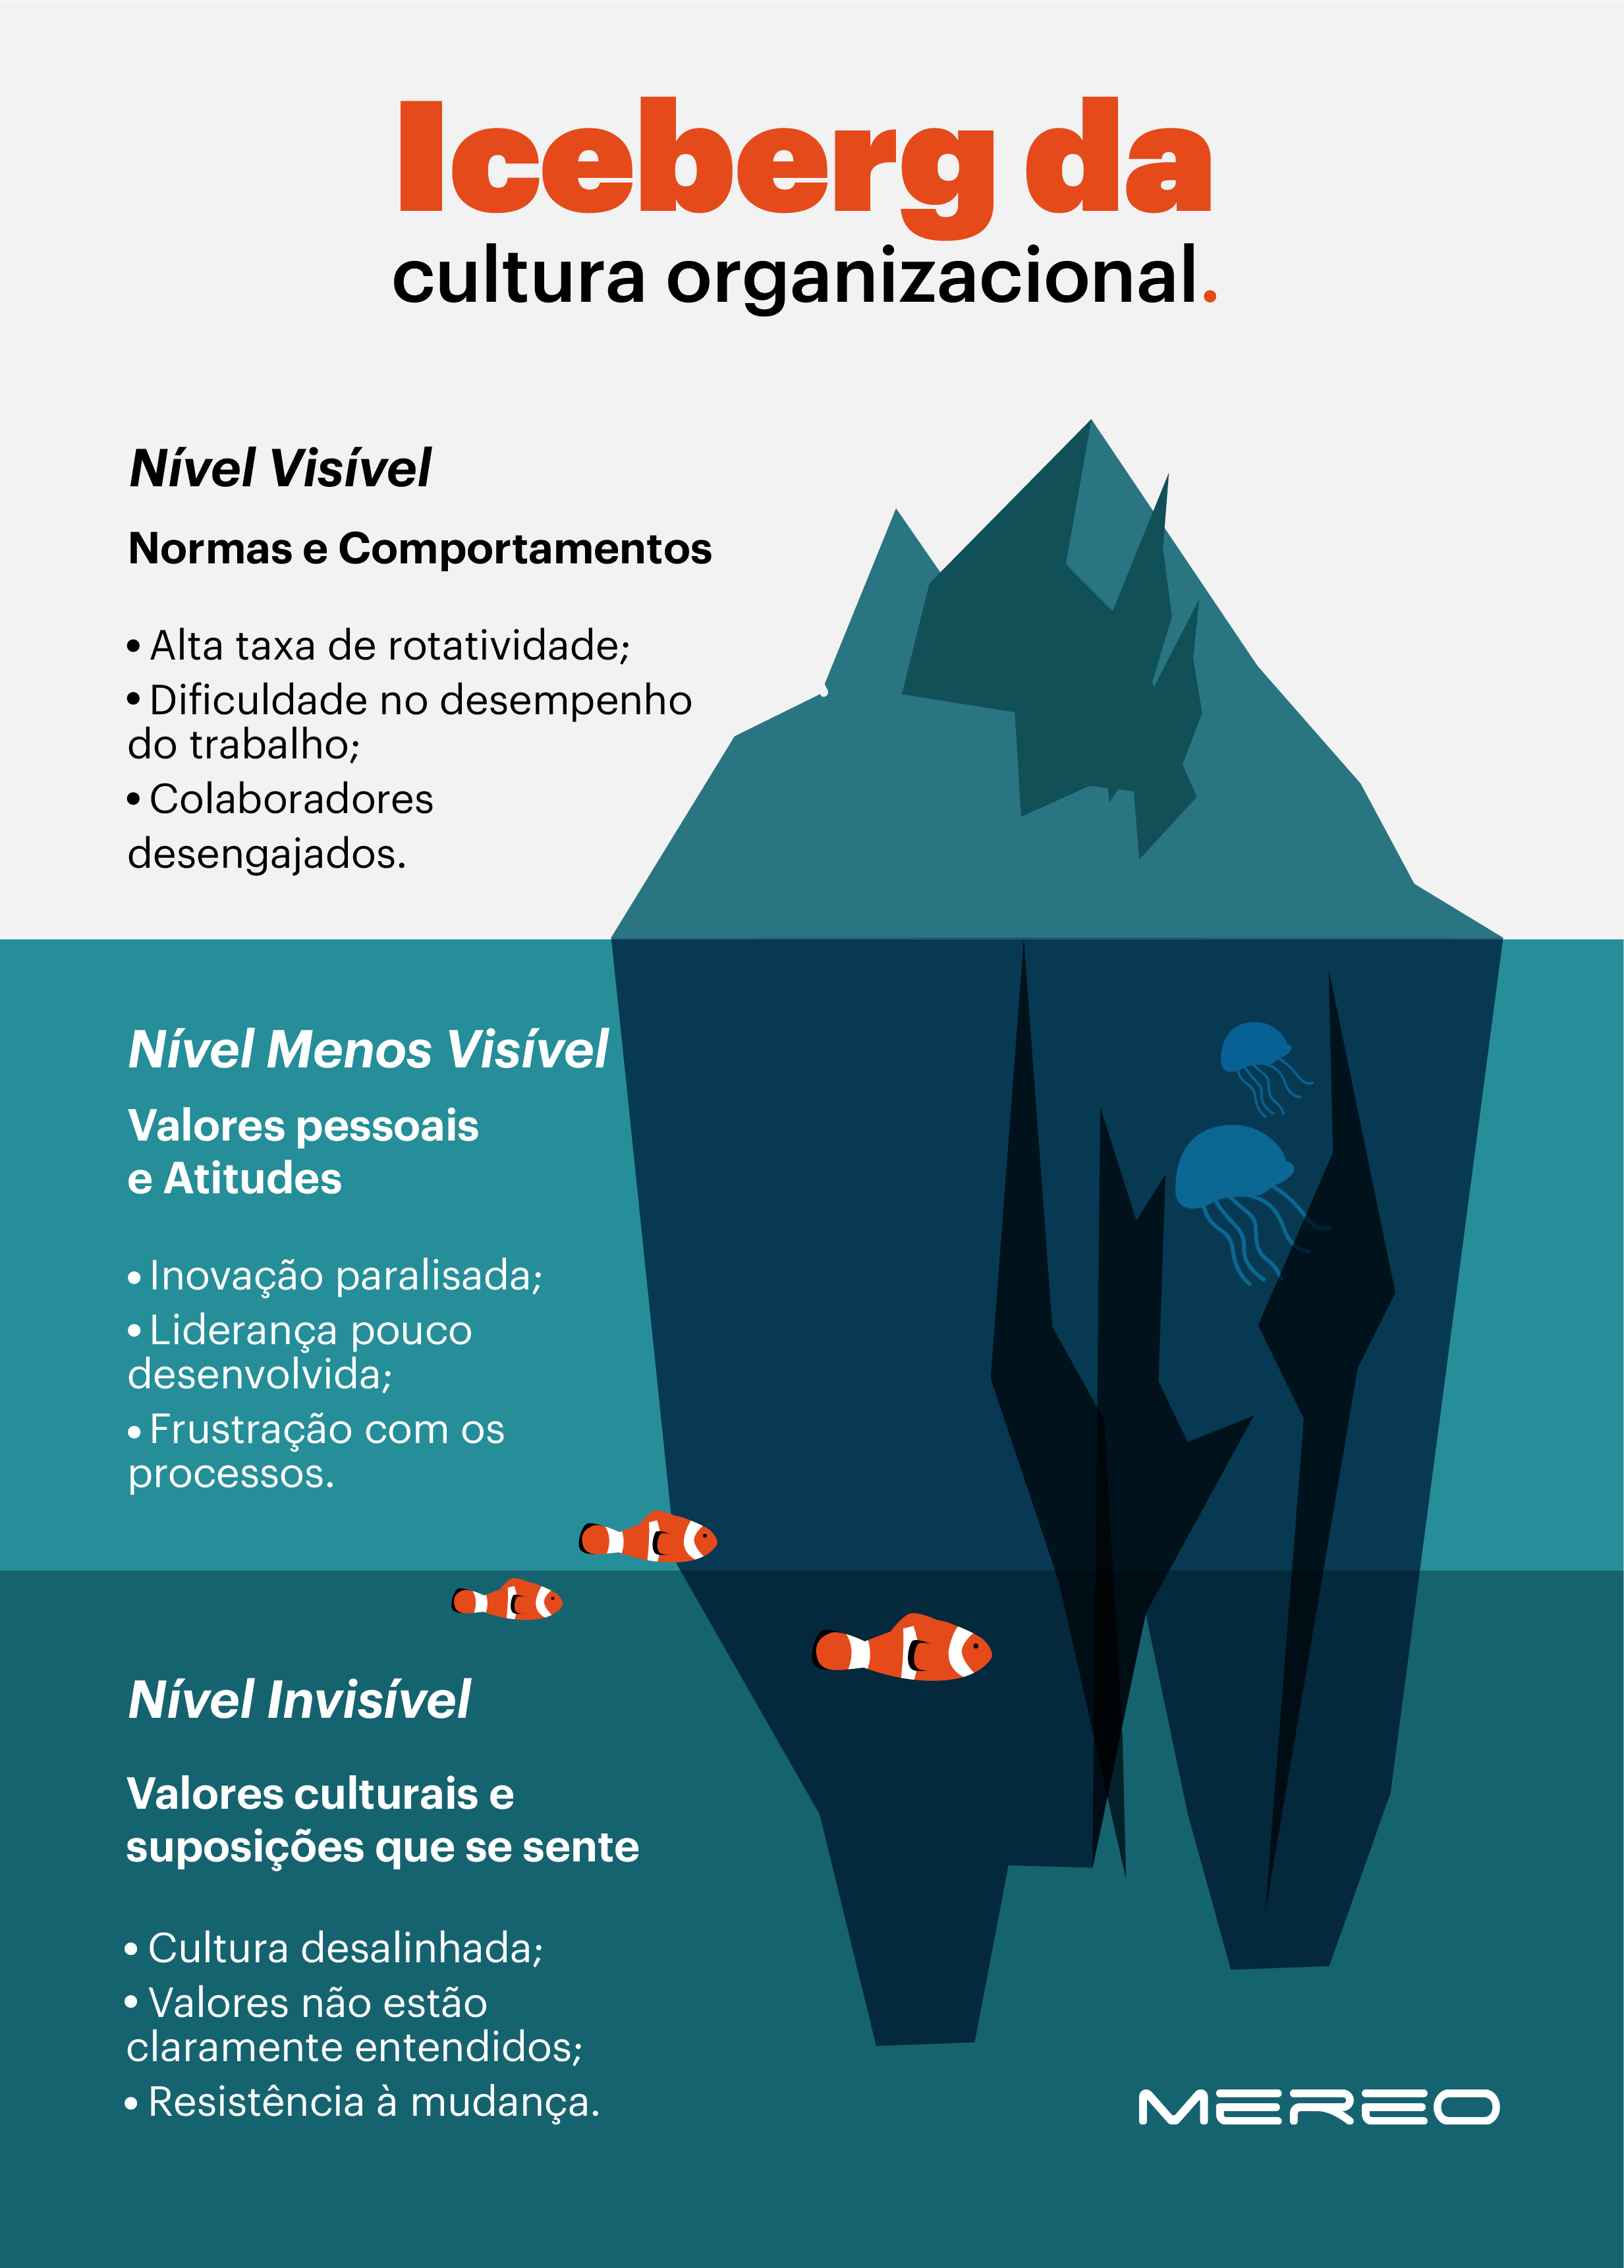 iceberg-da-cultura-organizacional